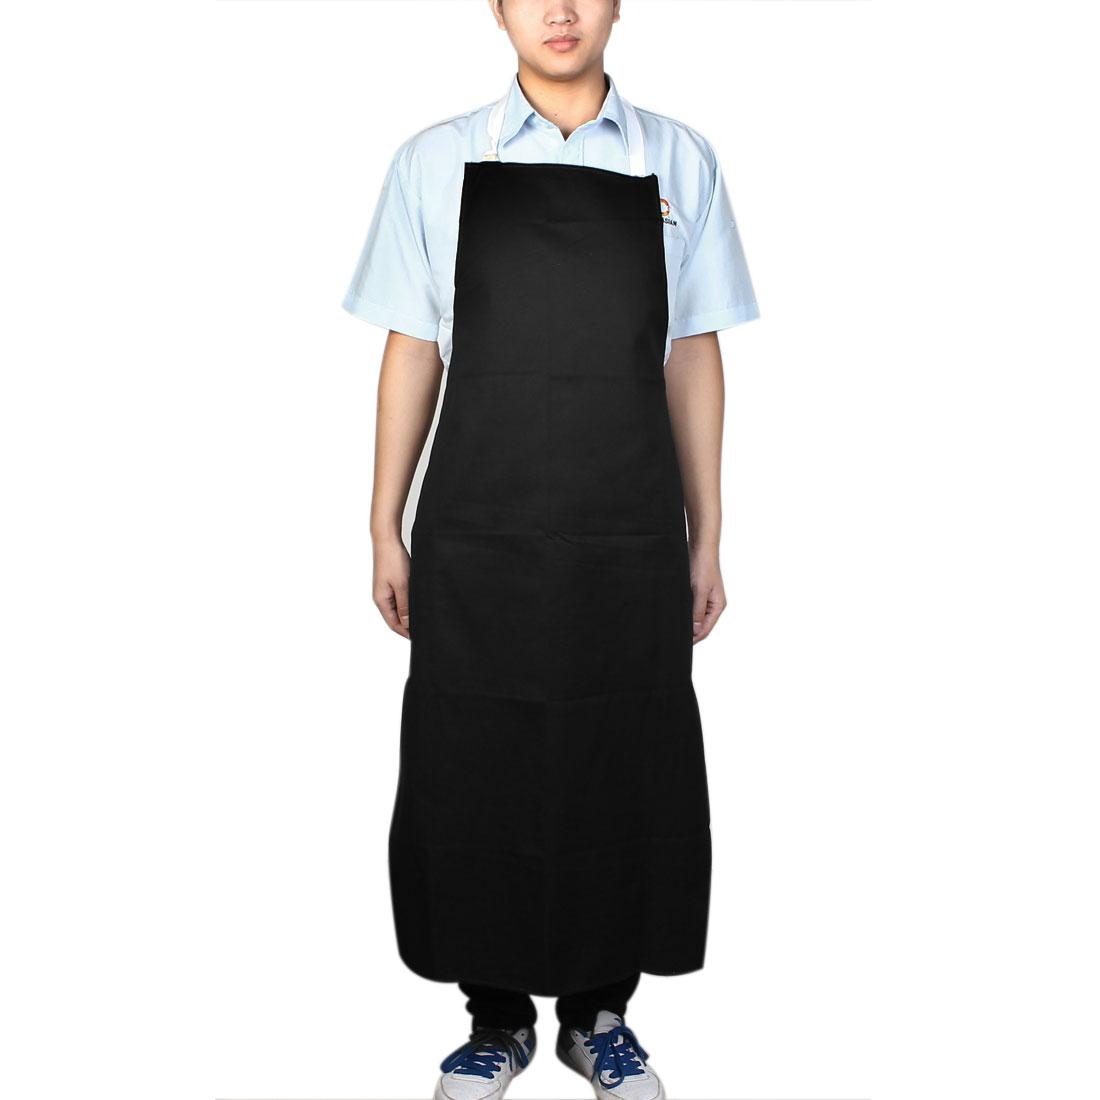 Kitchen Single Pocket Front Nylon Self Tie Bib Apron Dark Blue